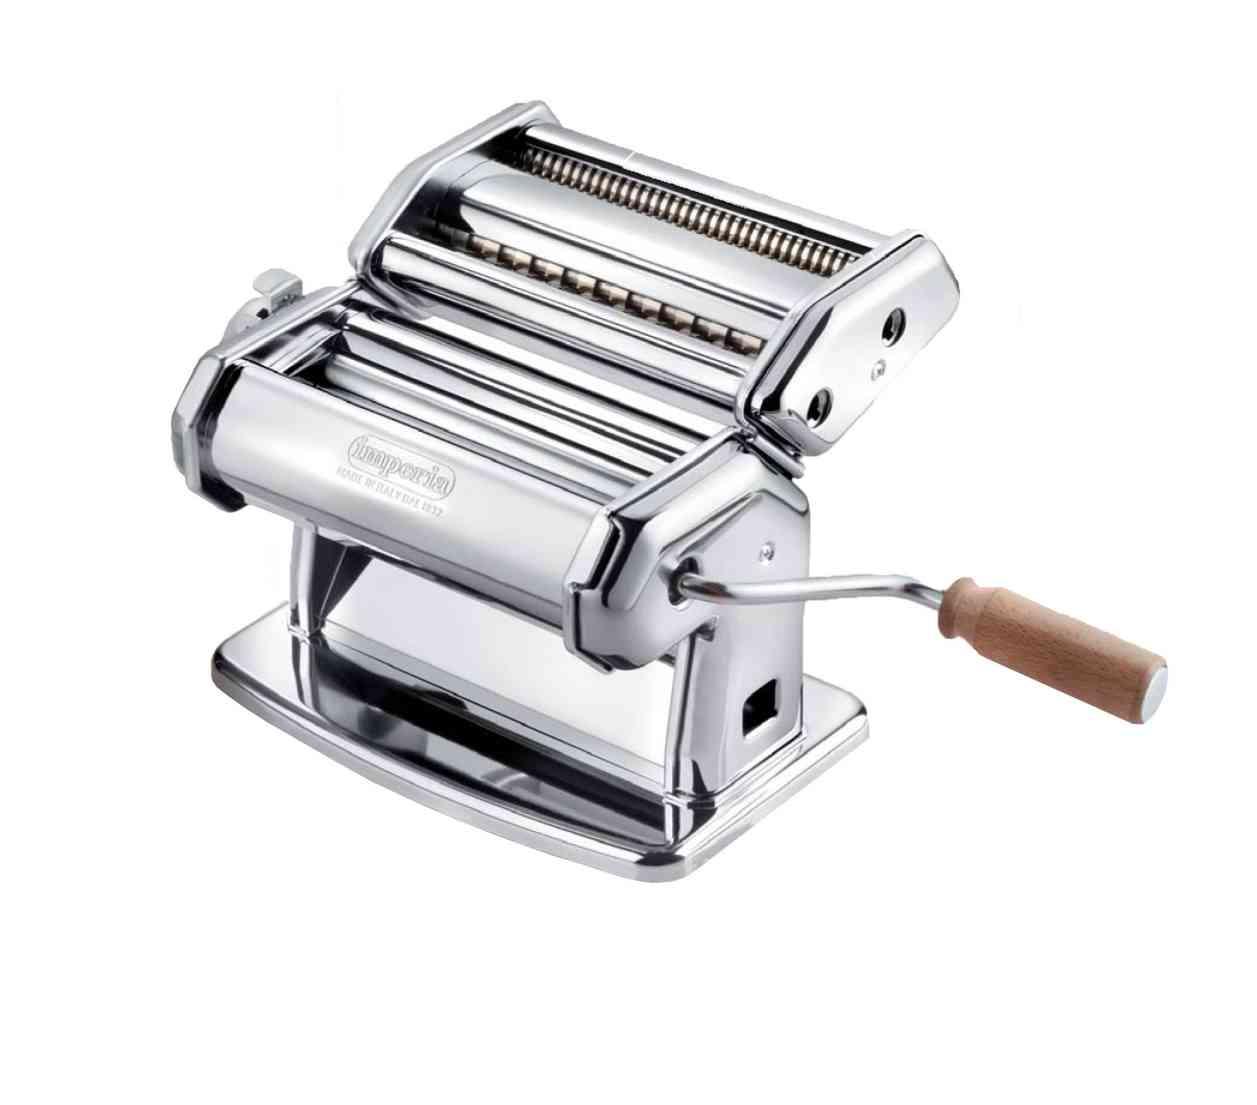 Imperia iPasta macchina sfogliatrice per pasta manuale acciaio